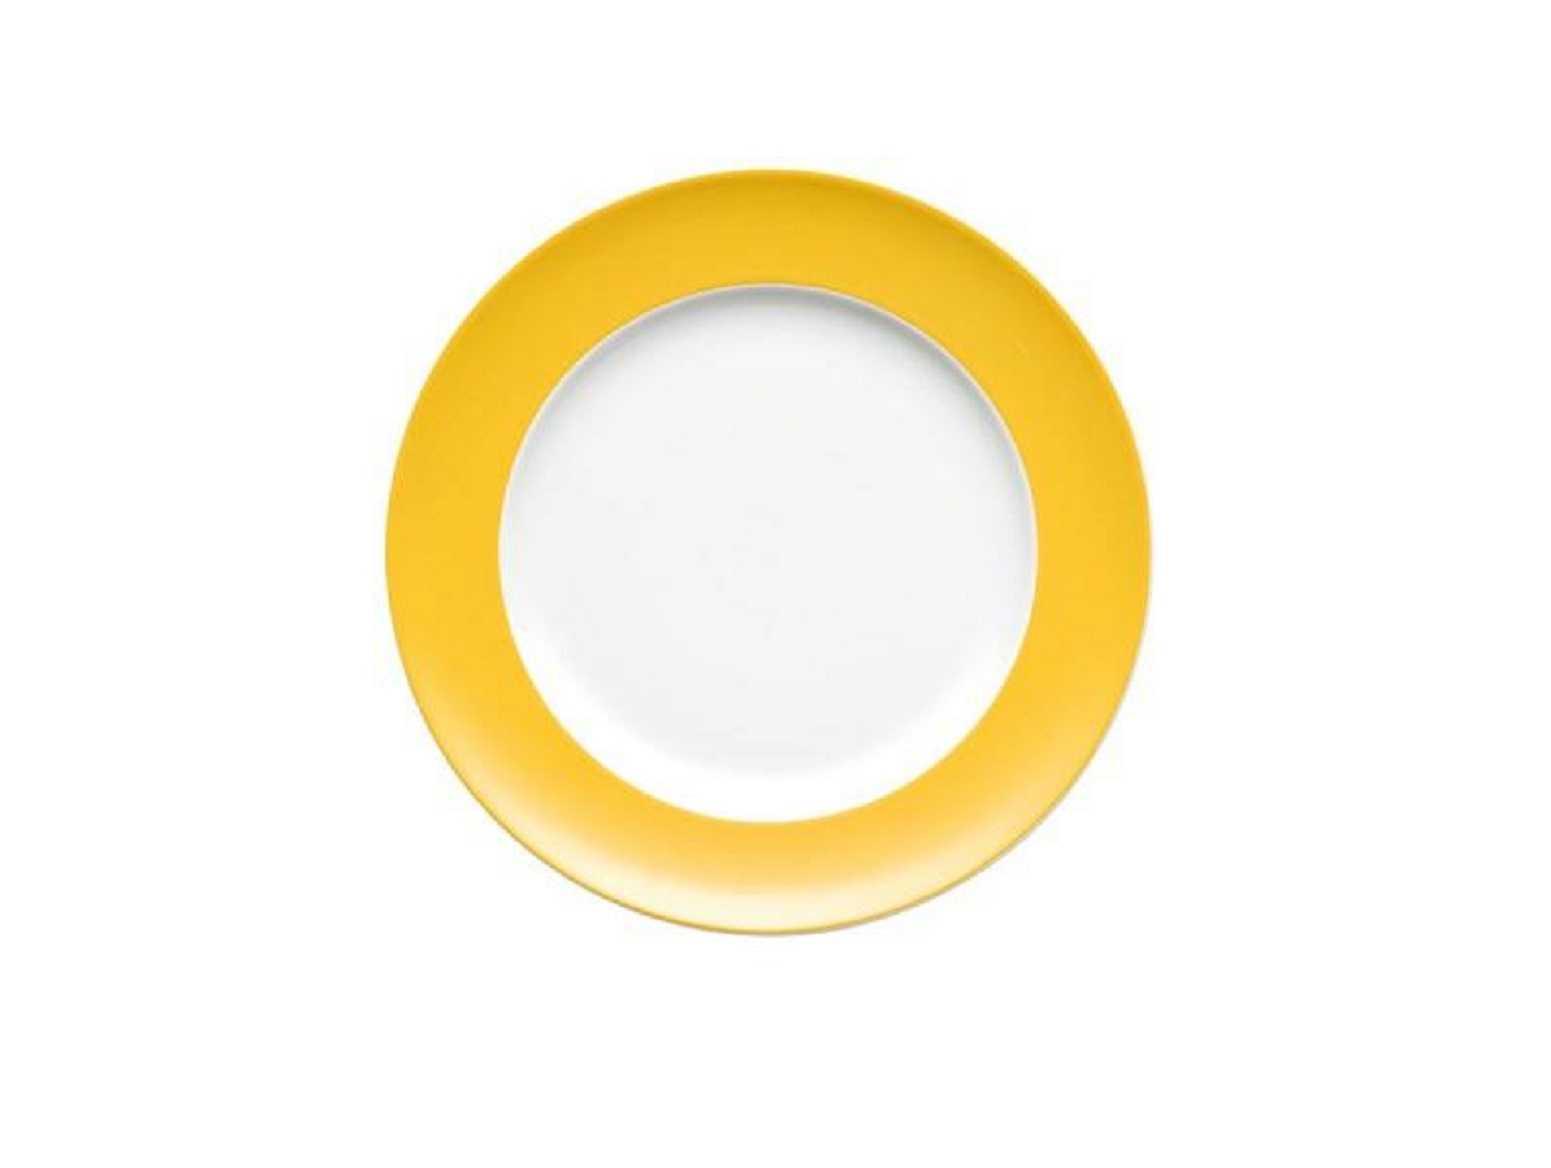 Онлайн каталог PROMENU: Тарелка десертная/закусочная Rosenthal SUNNY DAY, диаметр 22 см, желтый Rosenthal 70850-408502-10222